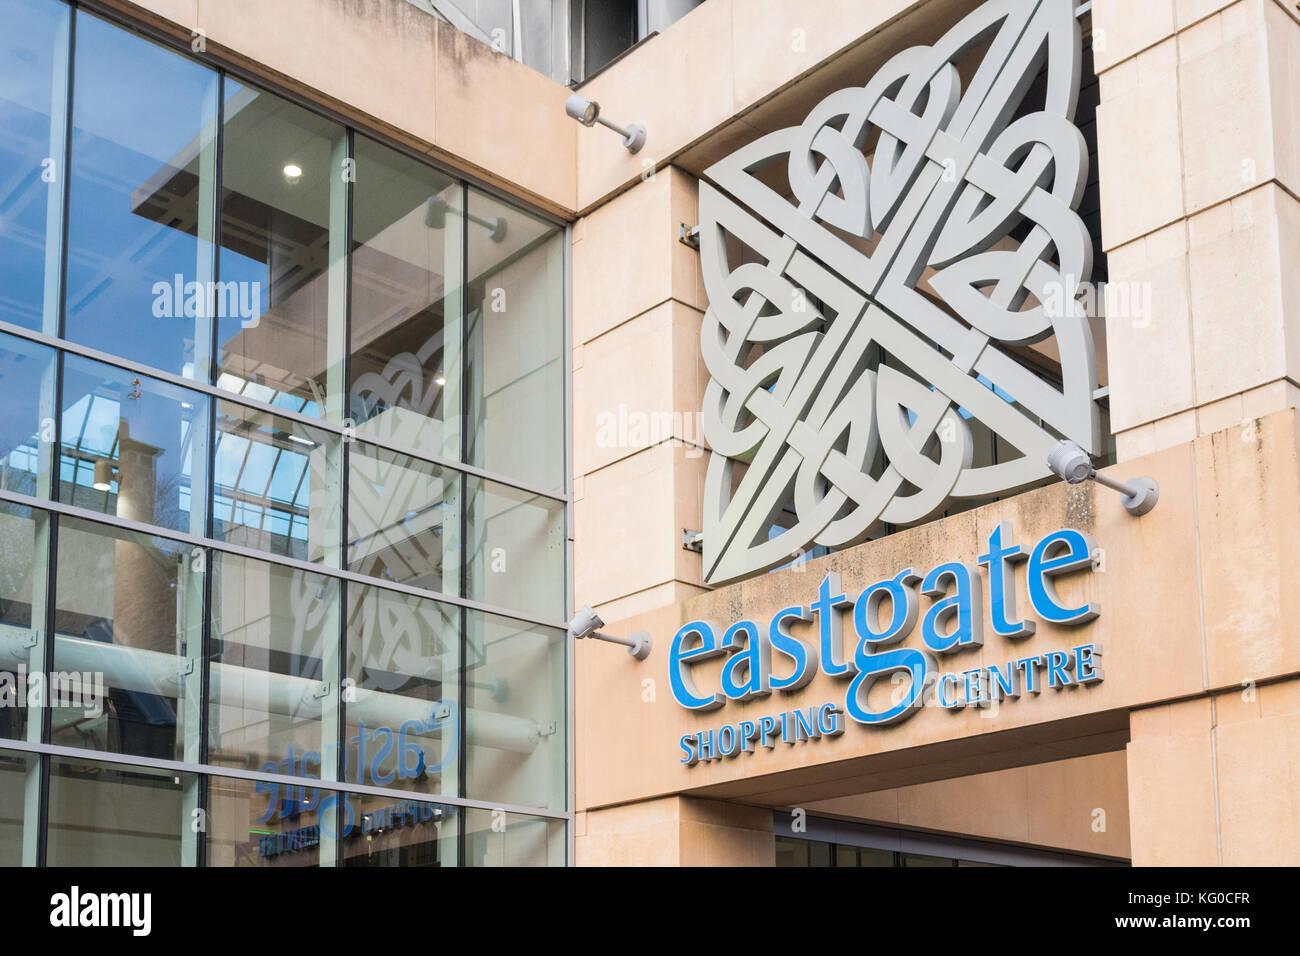 Eastgate Shopping Centre, Inverness, Scotland, UK - Stock Image